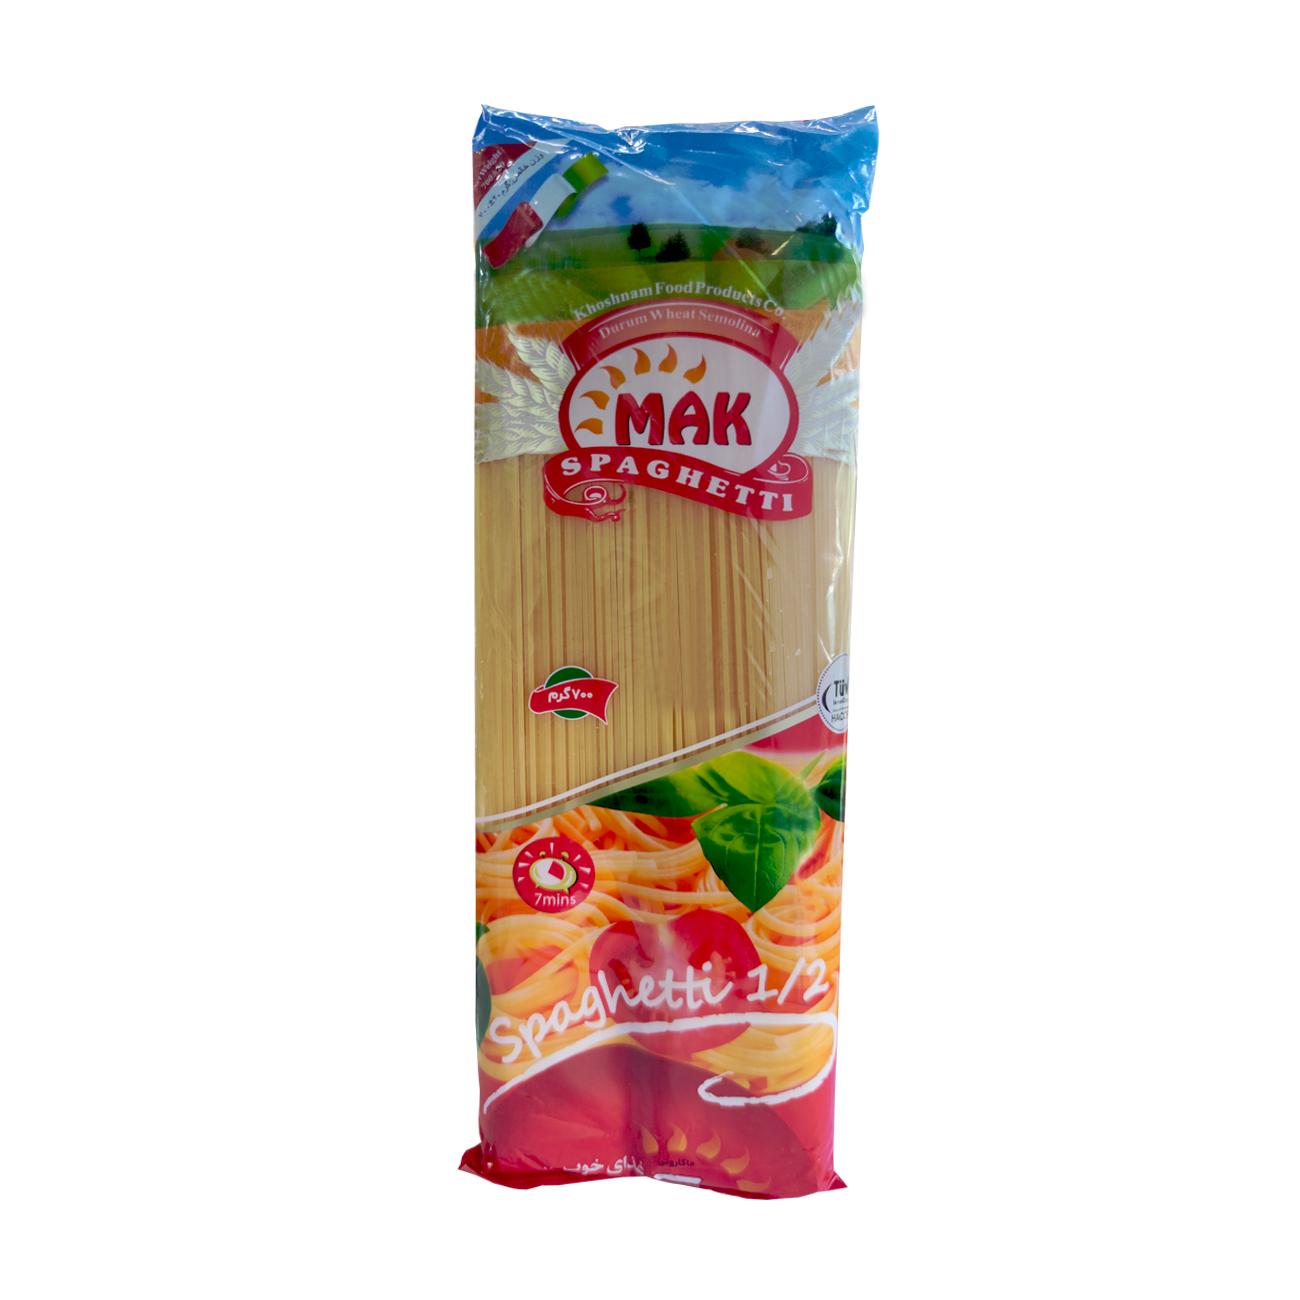 اسپاگتی قطر 1.2 مک ماکارون - 700 گرم